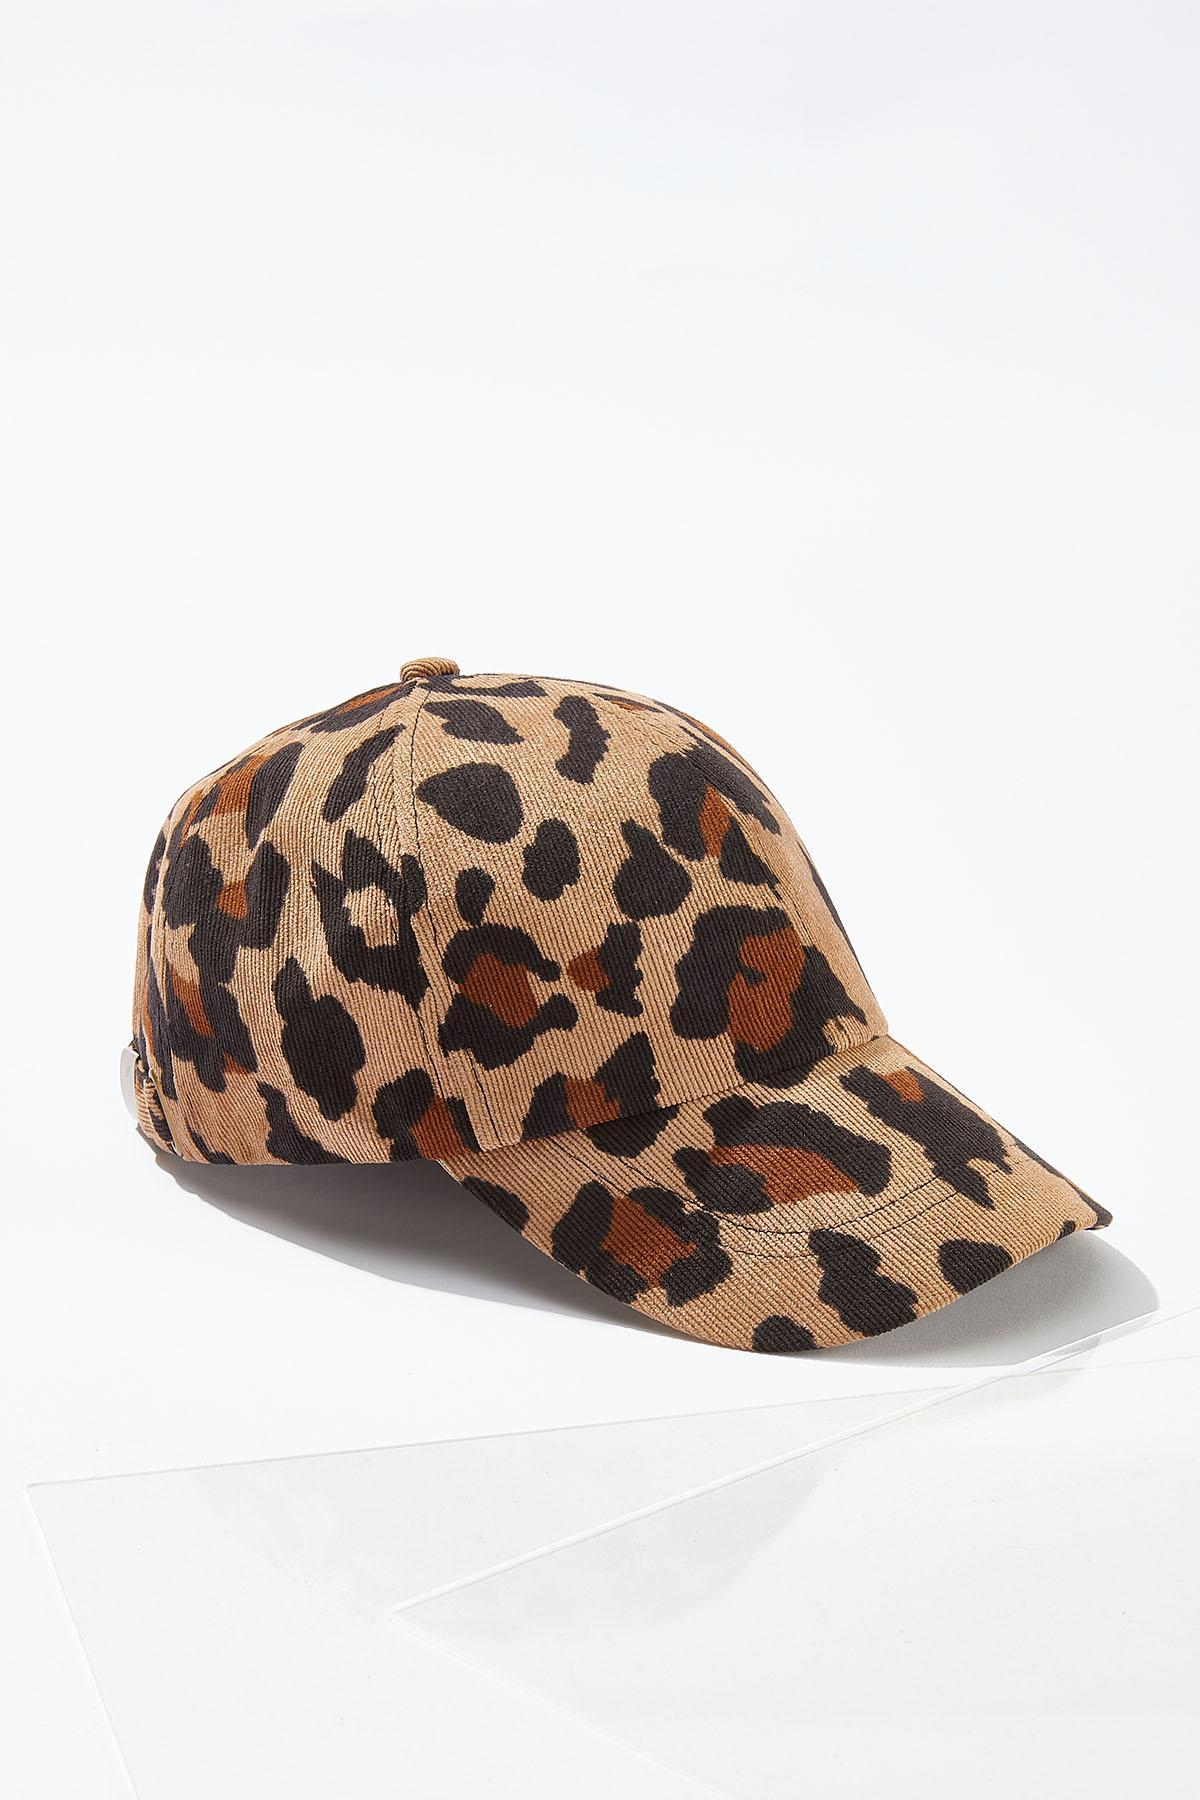 Leopard Corduroy Hat